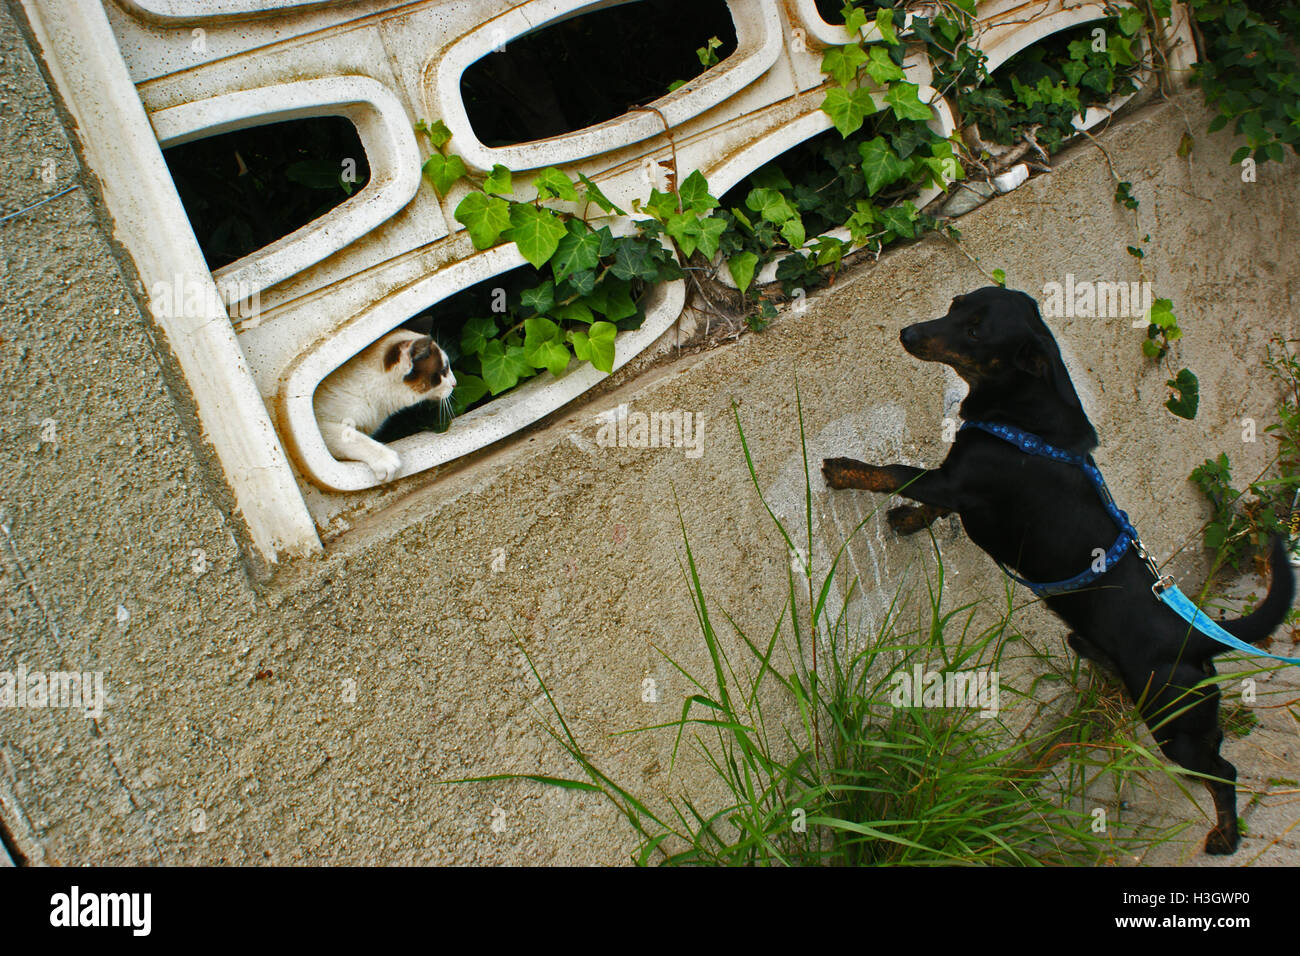 Cat interact whit dog. - Stock Image